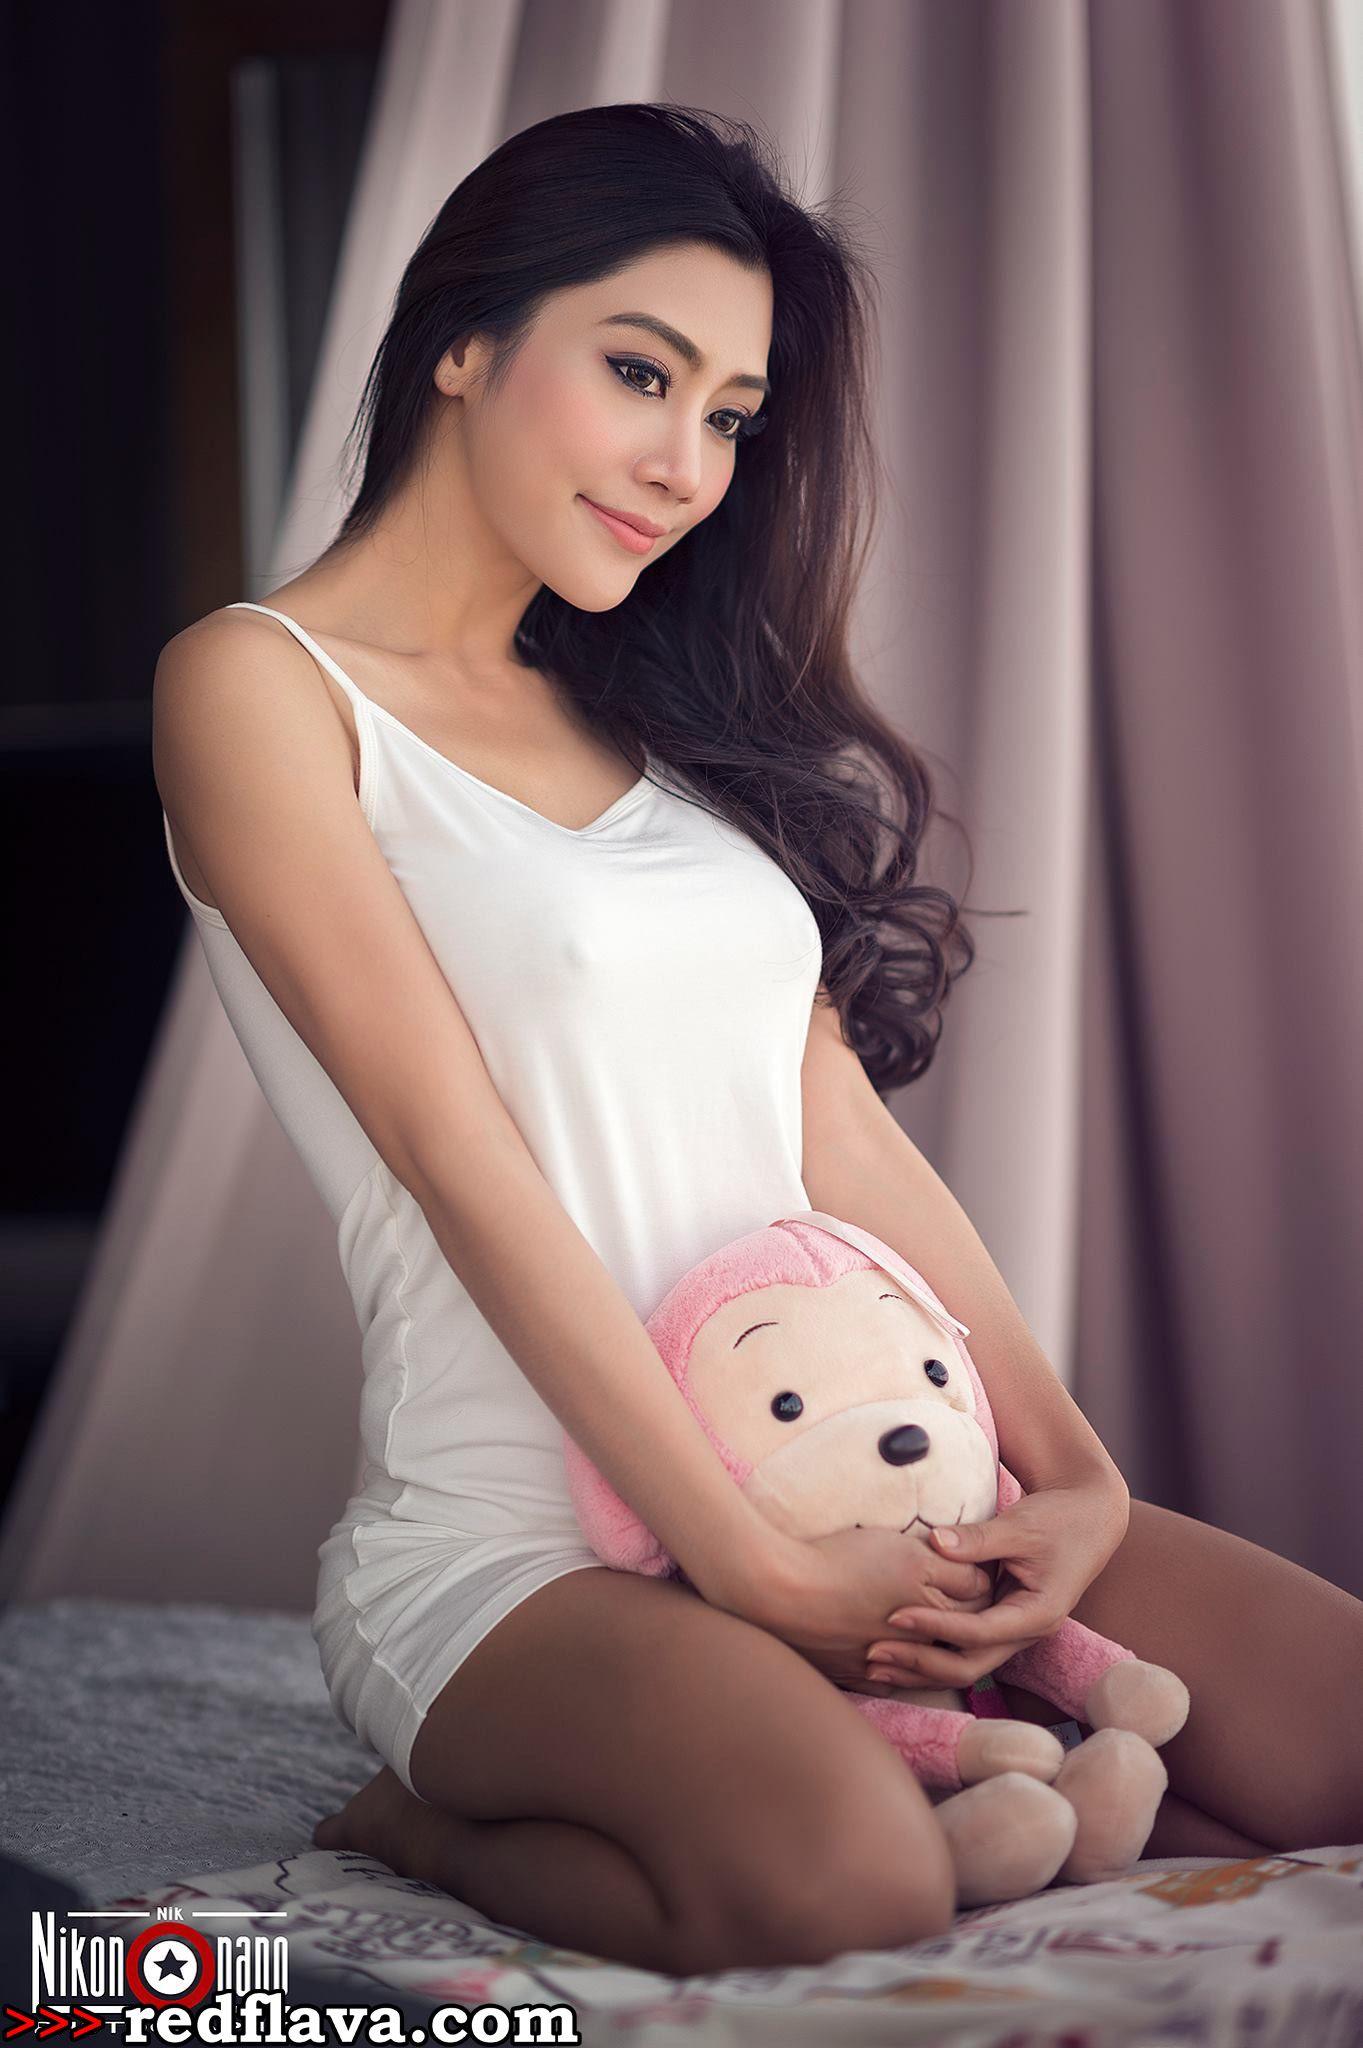 Teen asian model gallery